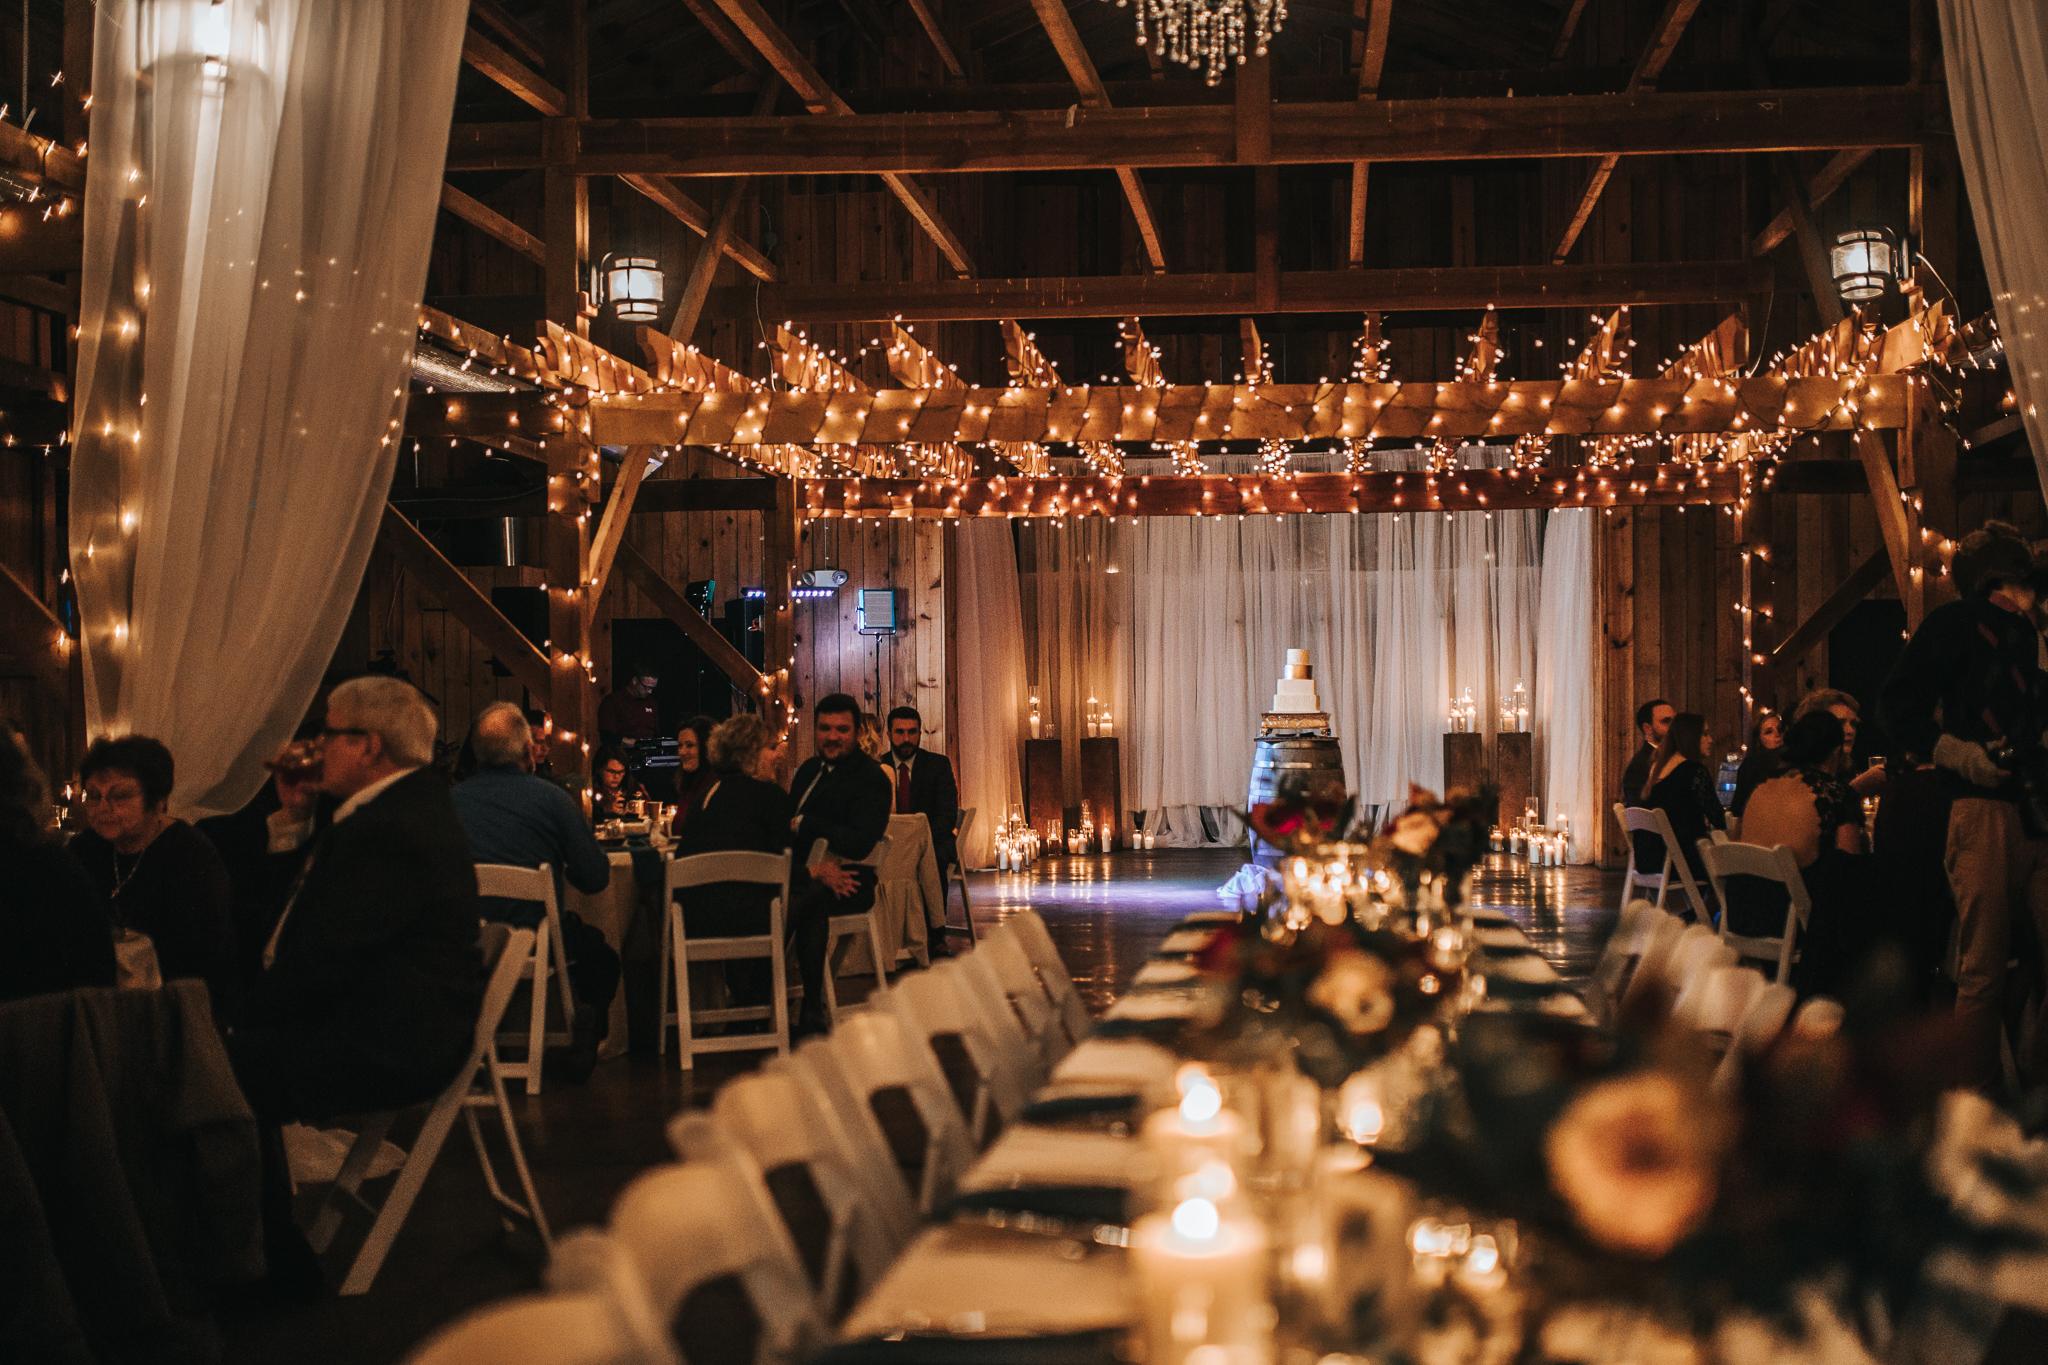 0143 Ariana Jordan Photo - Cameron & Lauren's Wedding at Talon Winery  7330.jpg